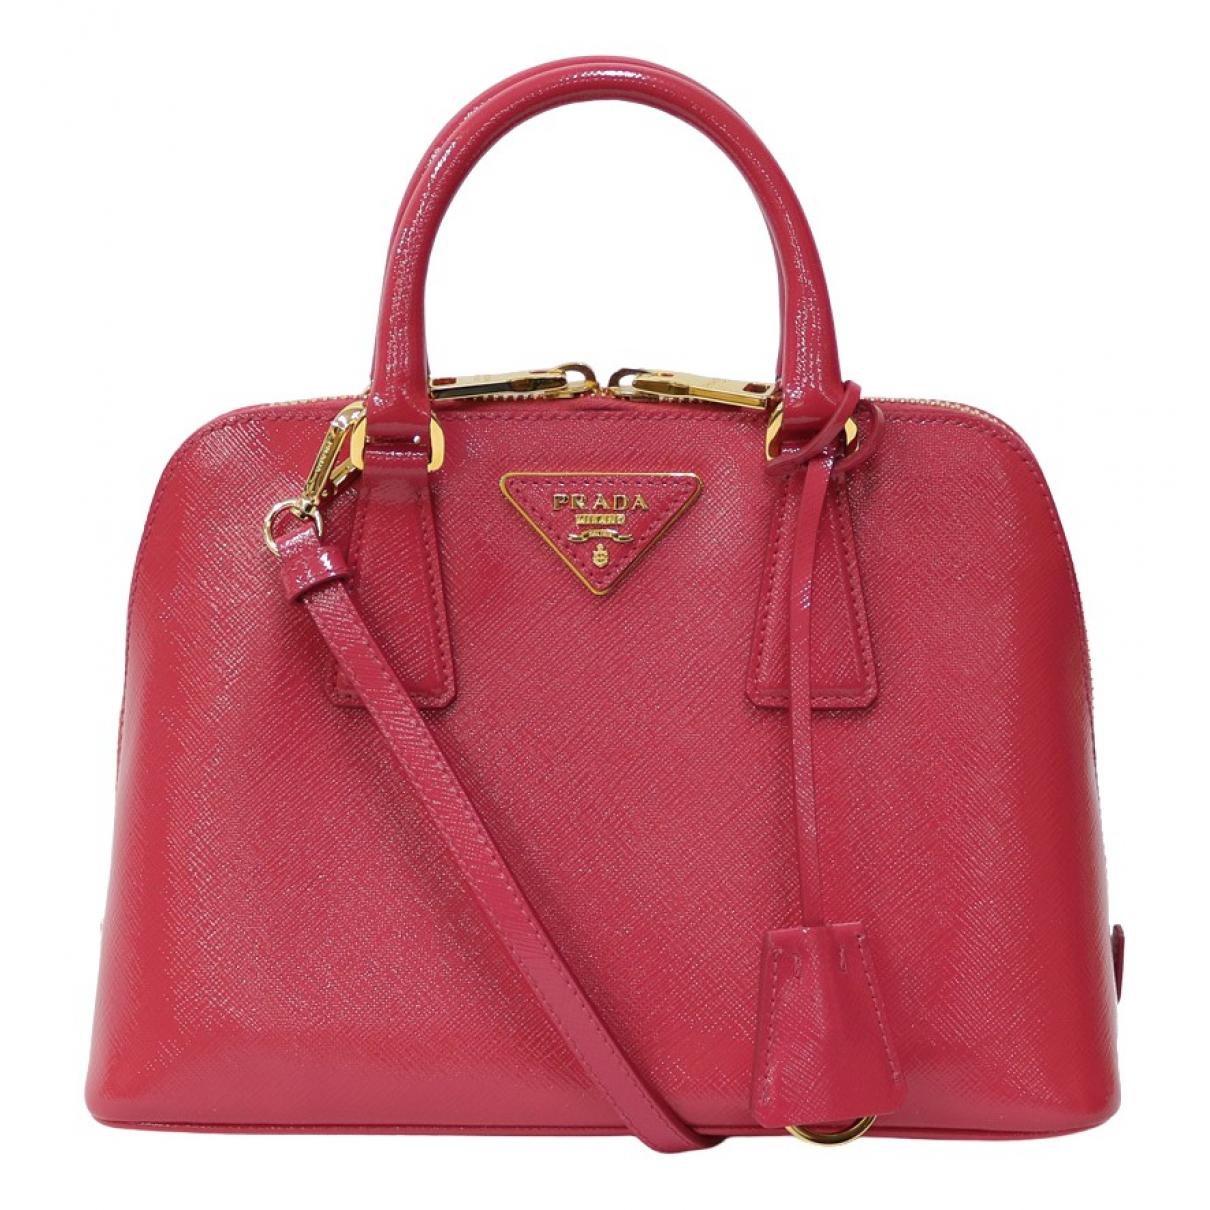 Prada \N Pink Leather handbag for Women \N